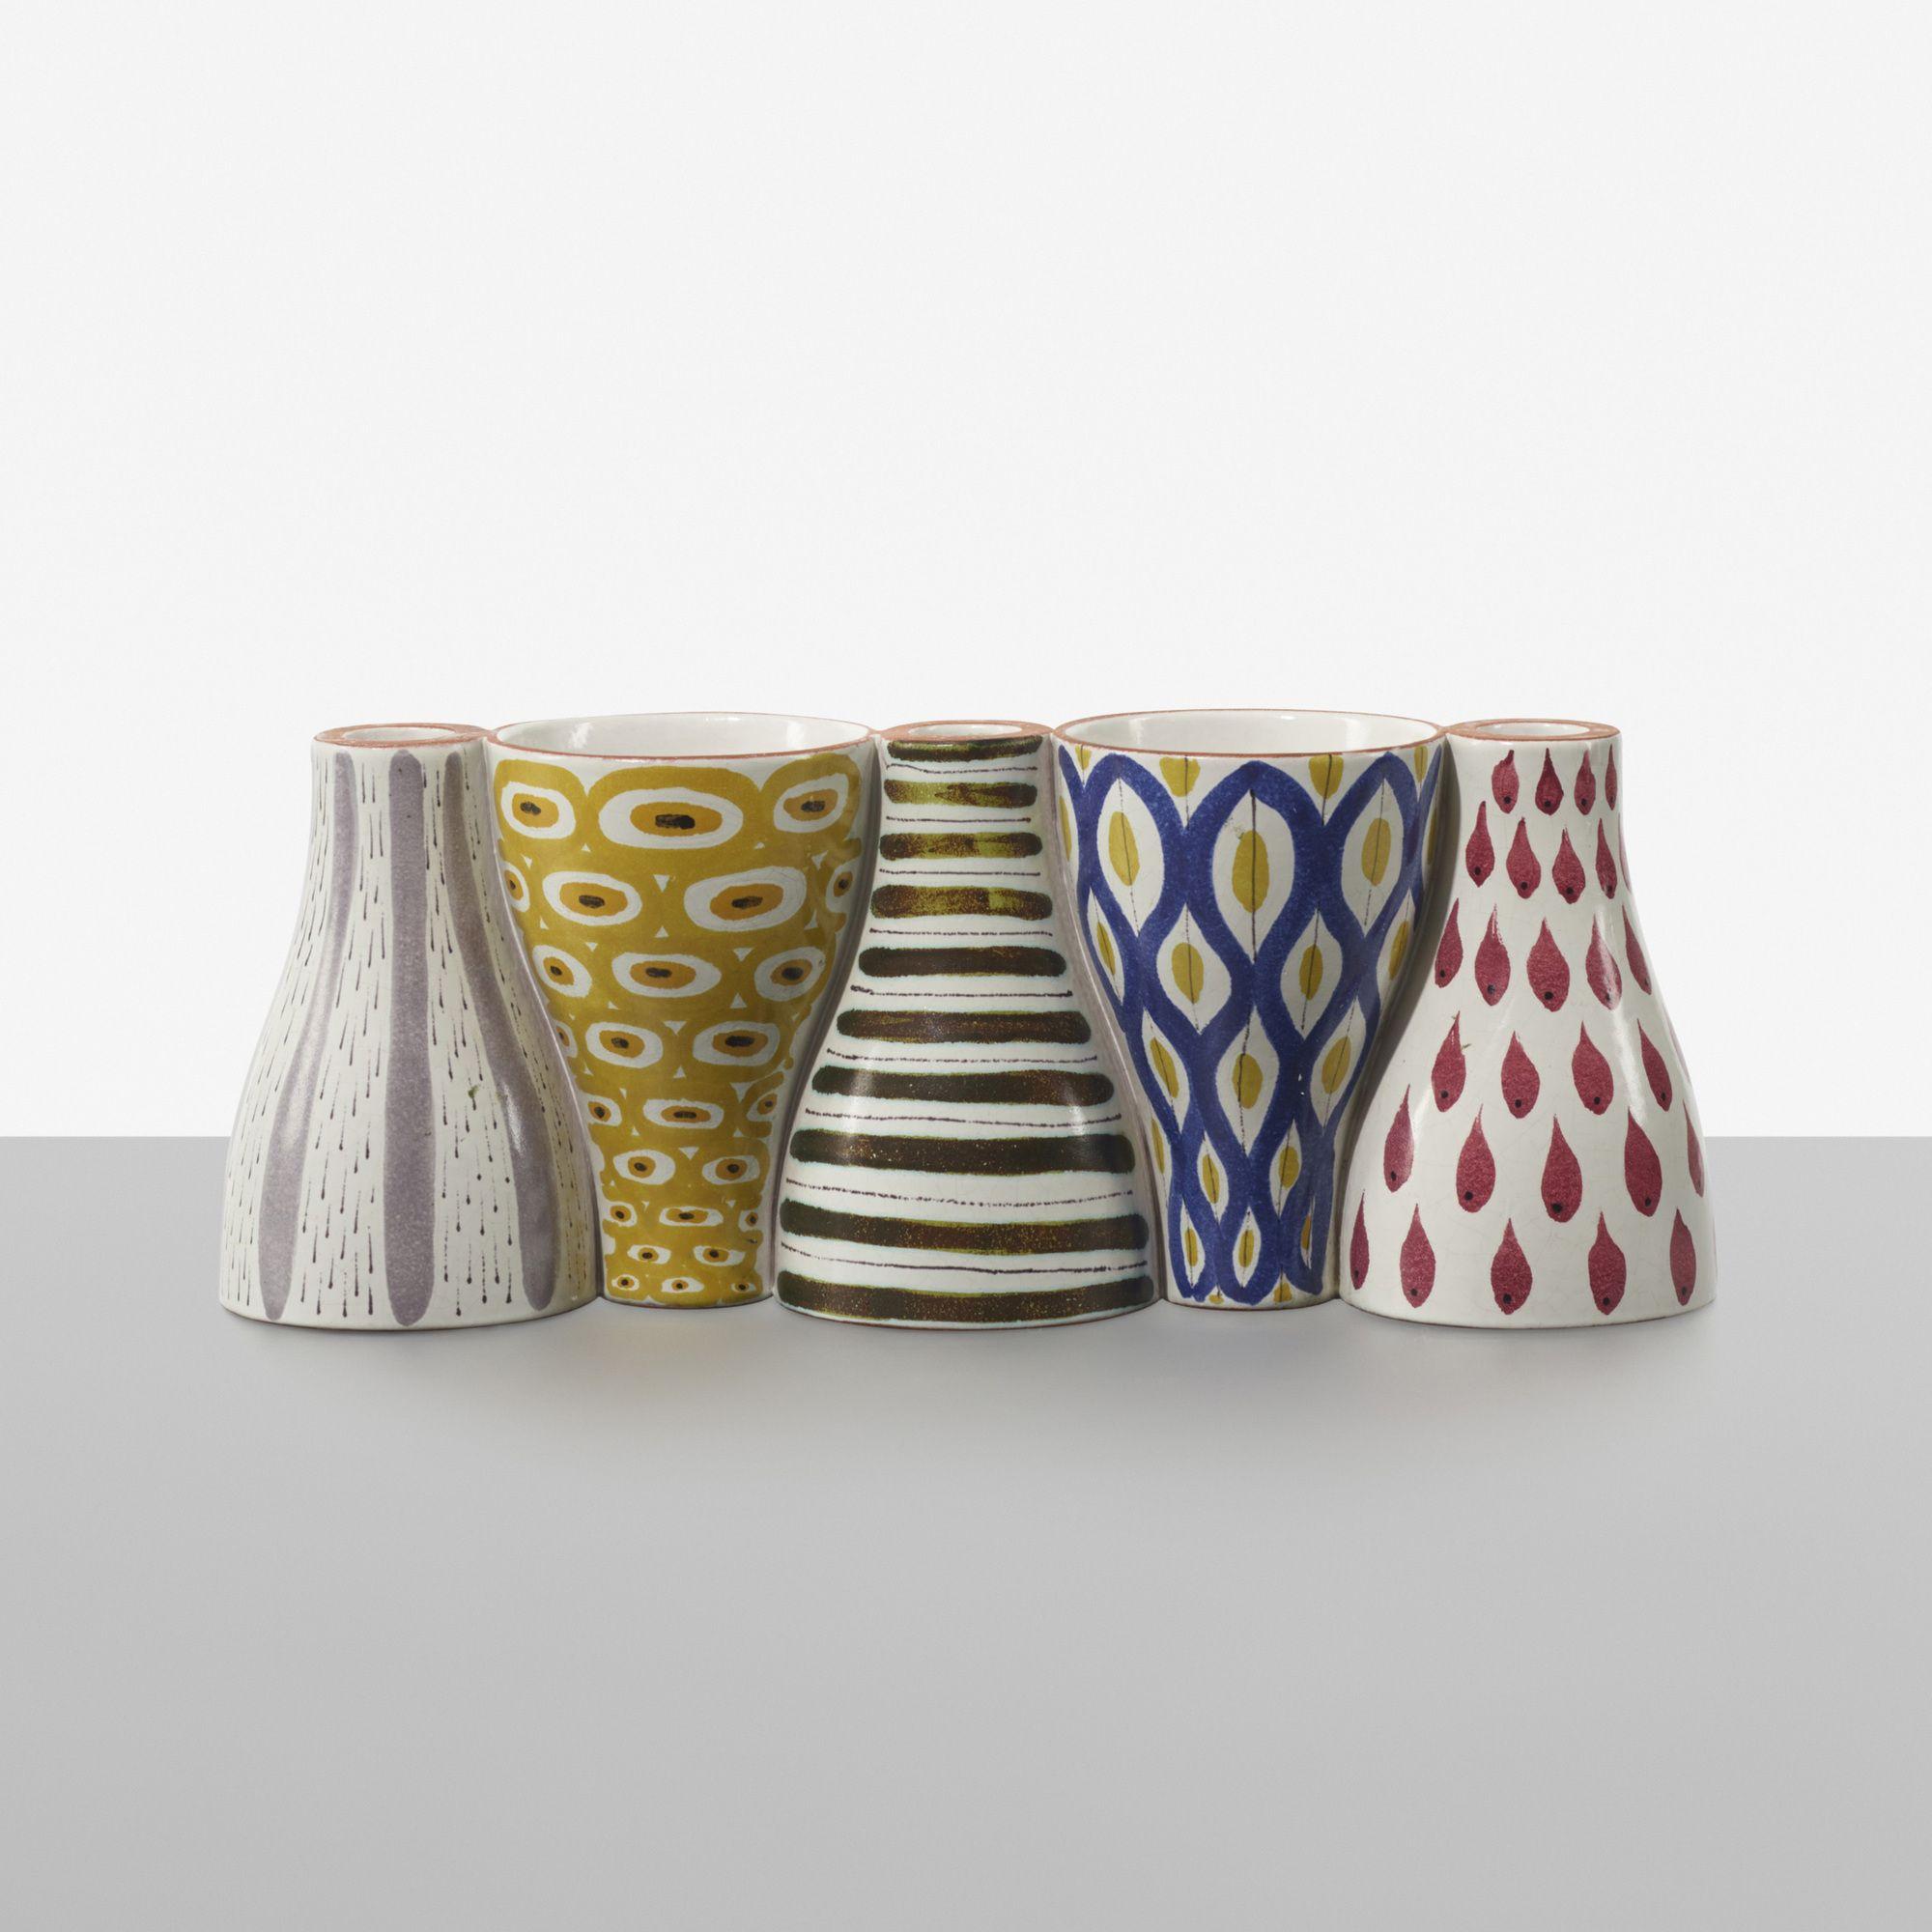 Hans Olsen 1956 Vintage Keramik Vintage Keramik